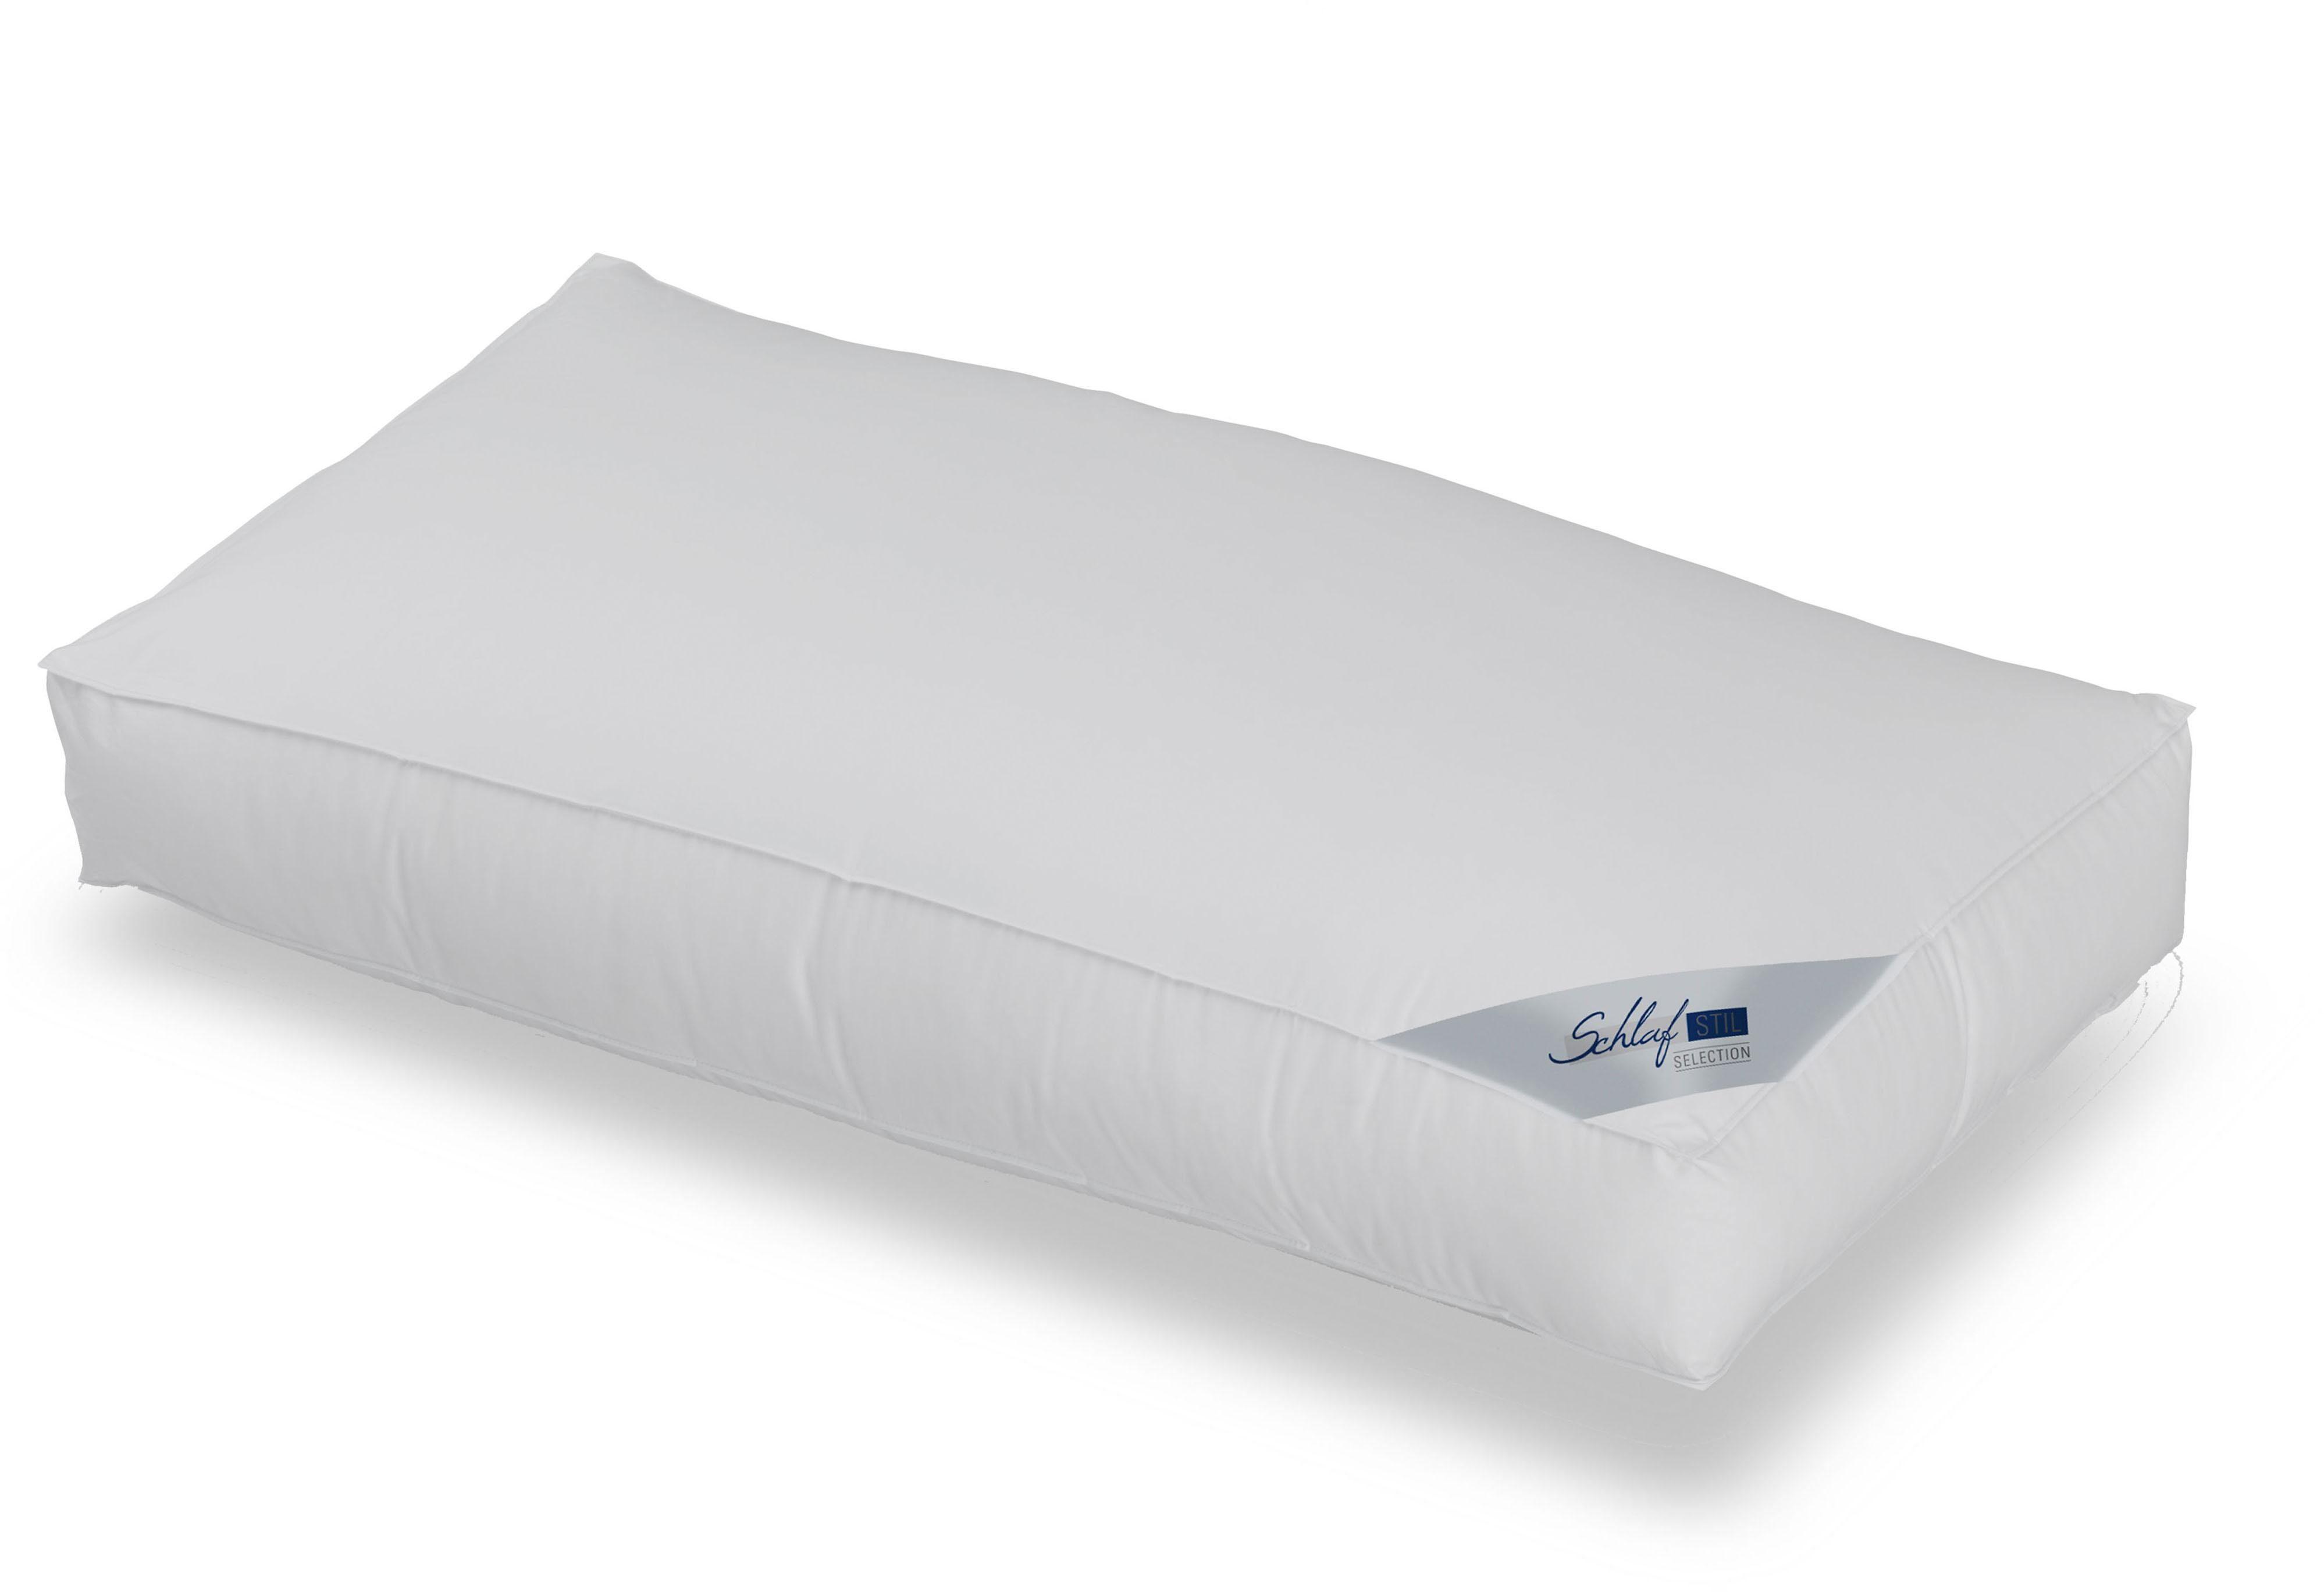 3-Kammer-Kopfkissen, »Rubin, Selection, 10 cm hoher Außensteg«, Schlafstil